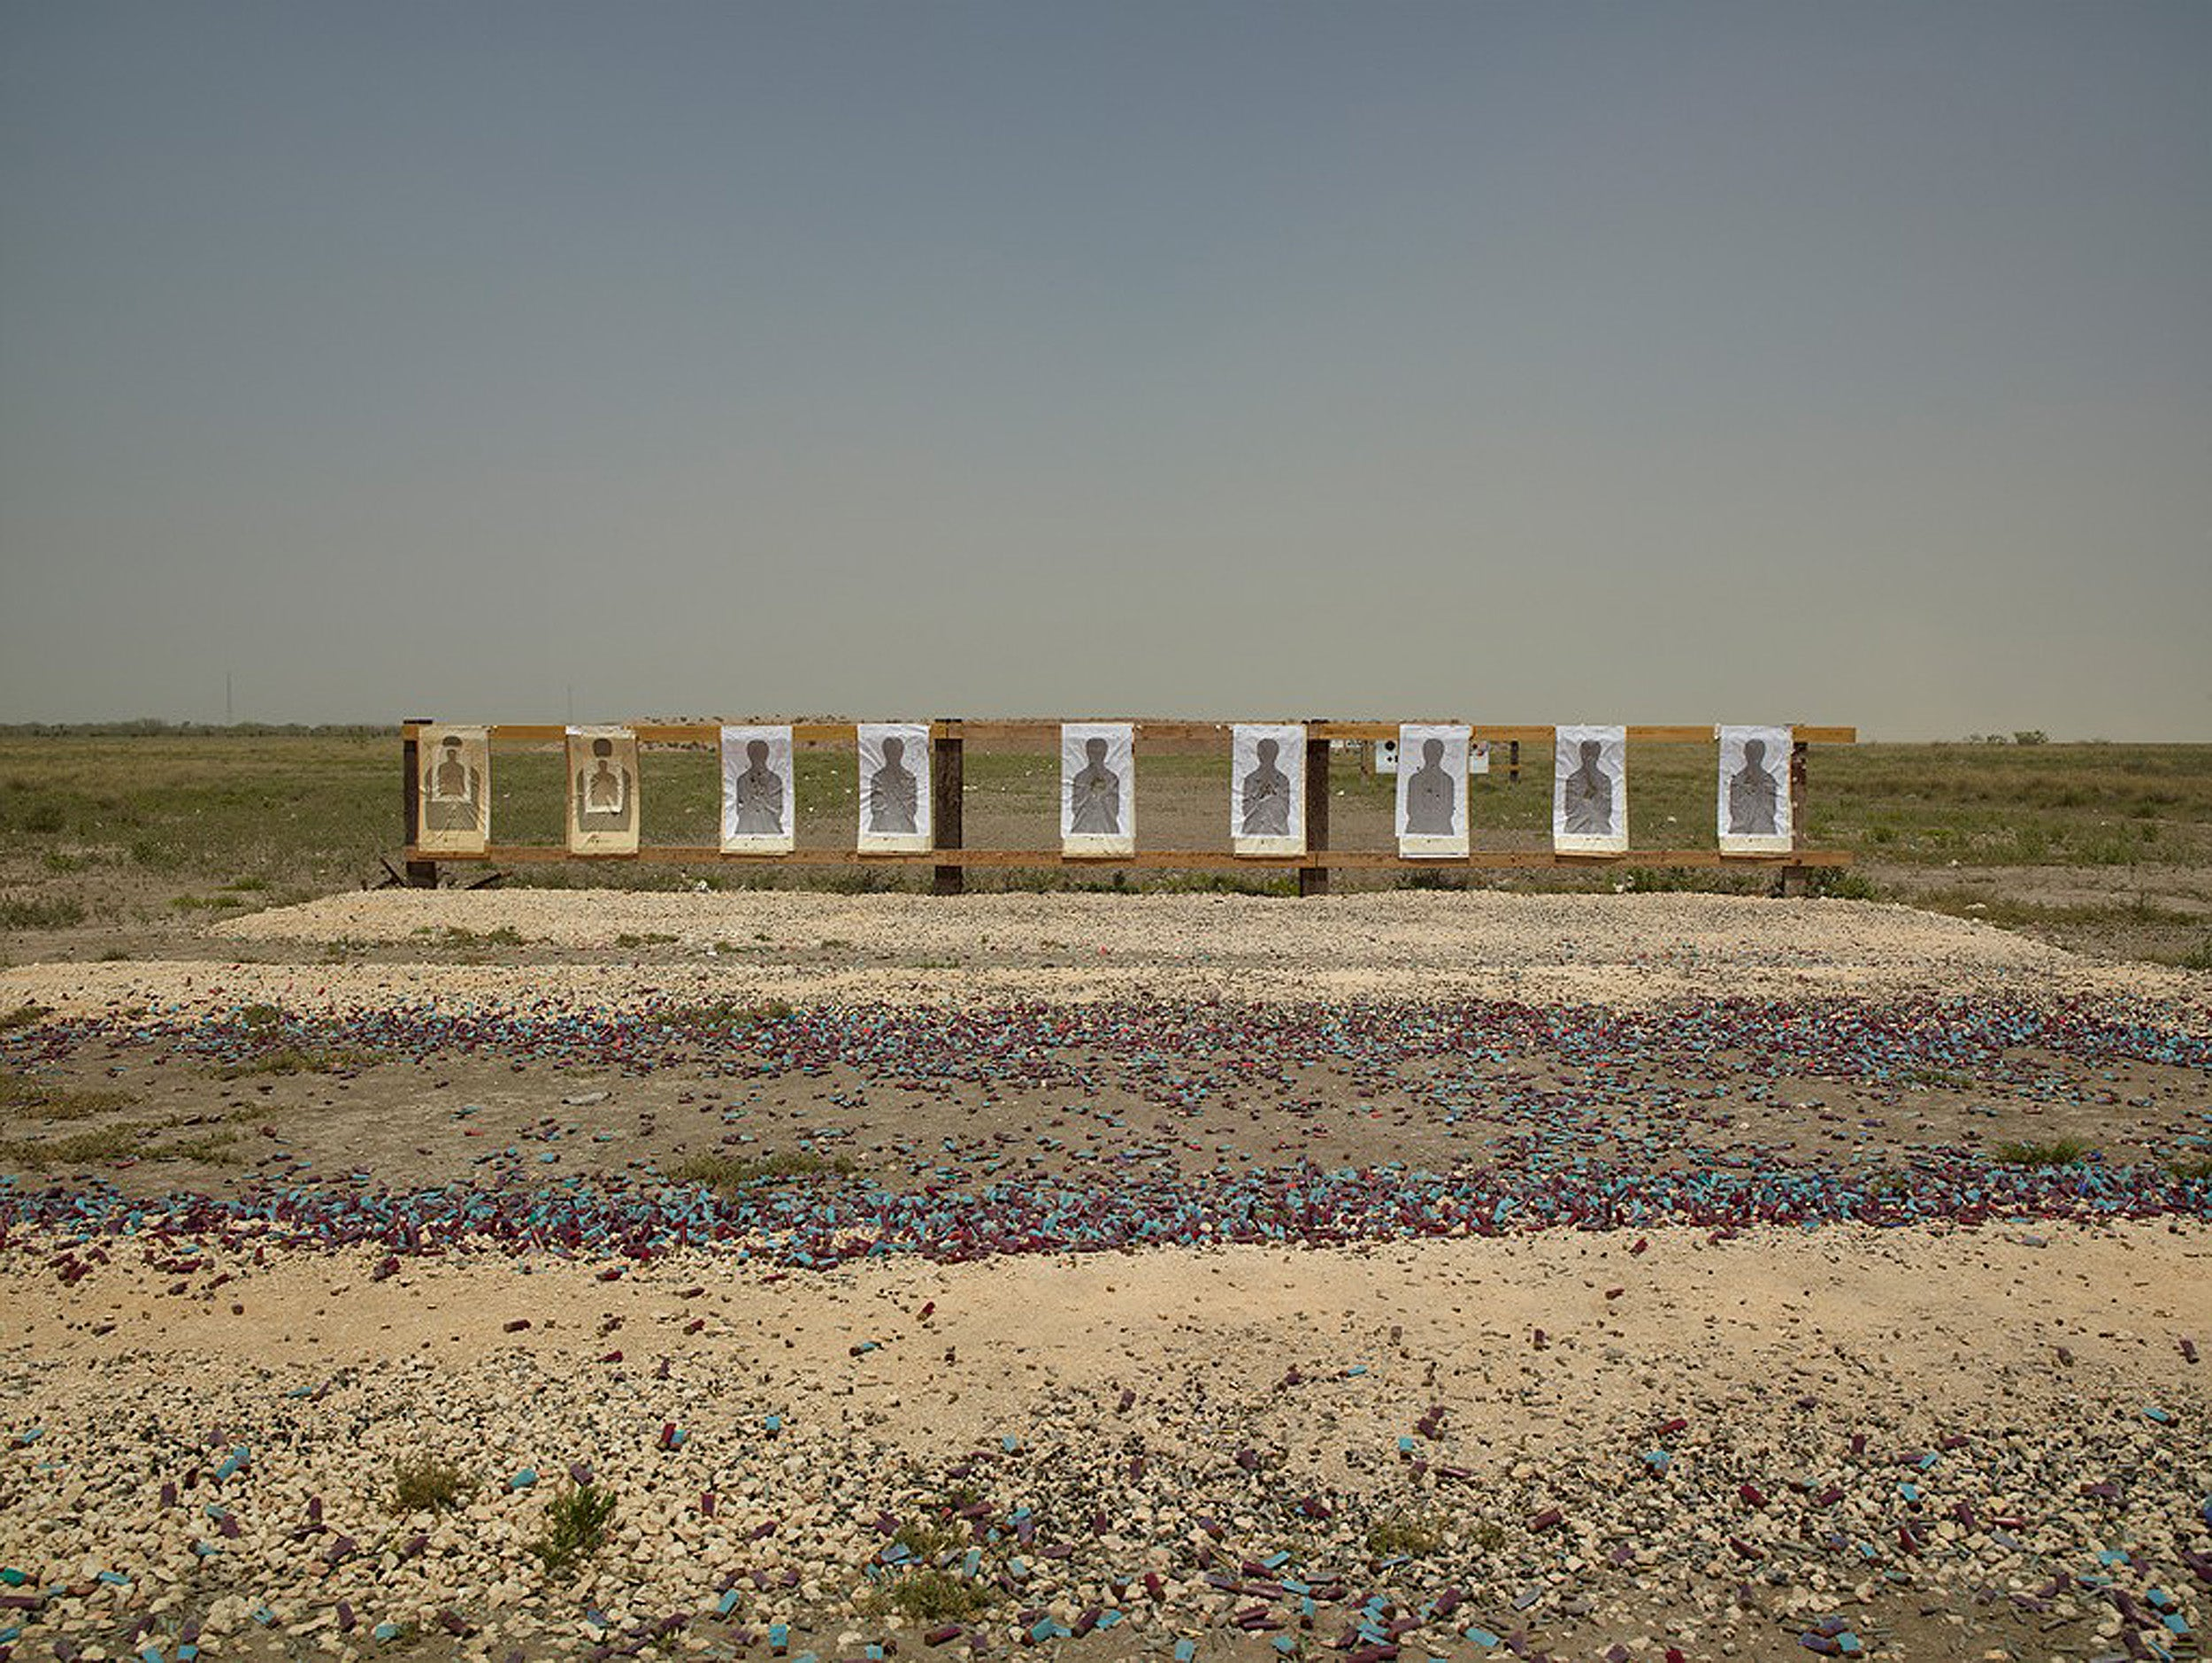 A target range near the U.S.-Mexico border.